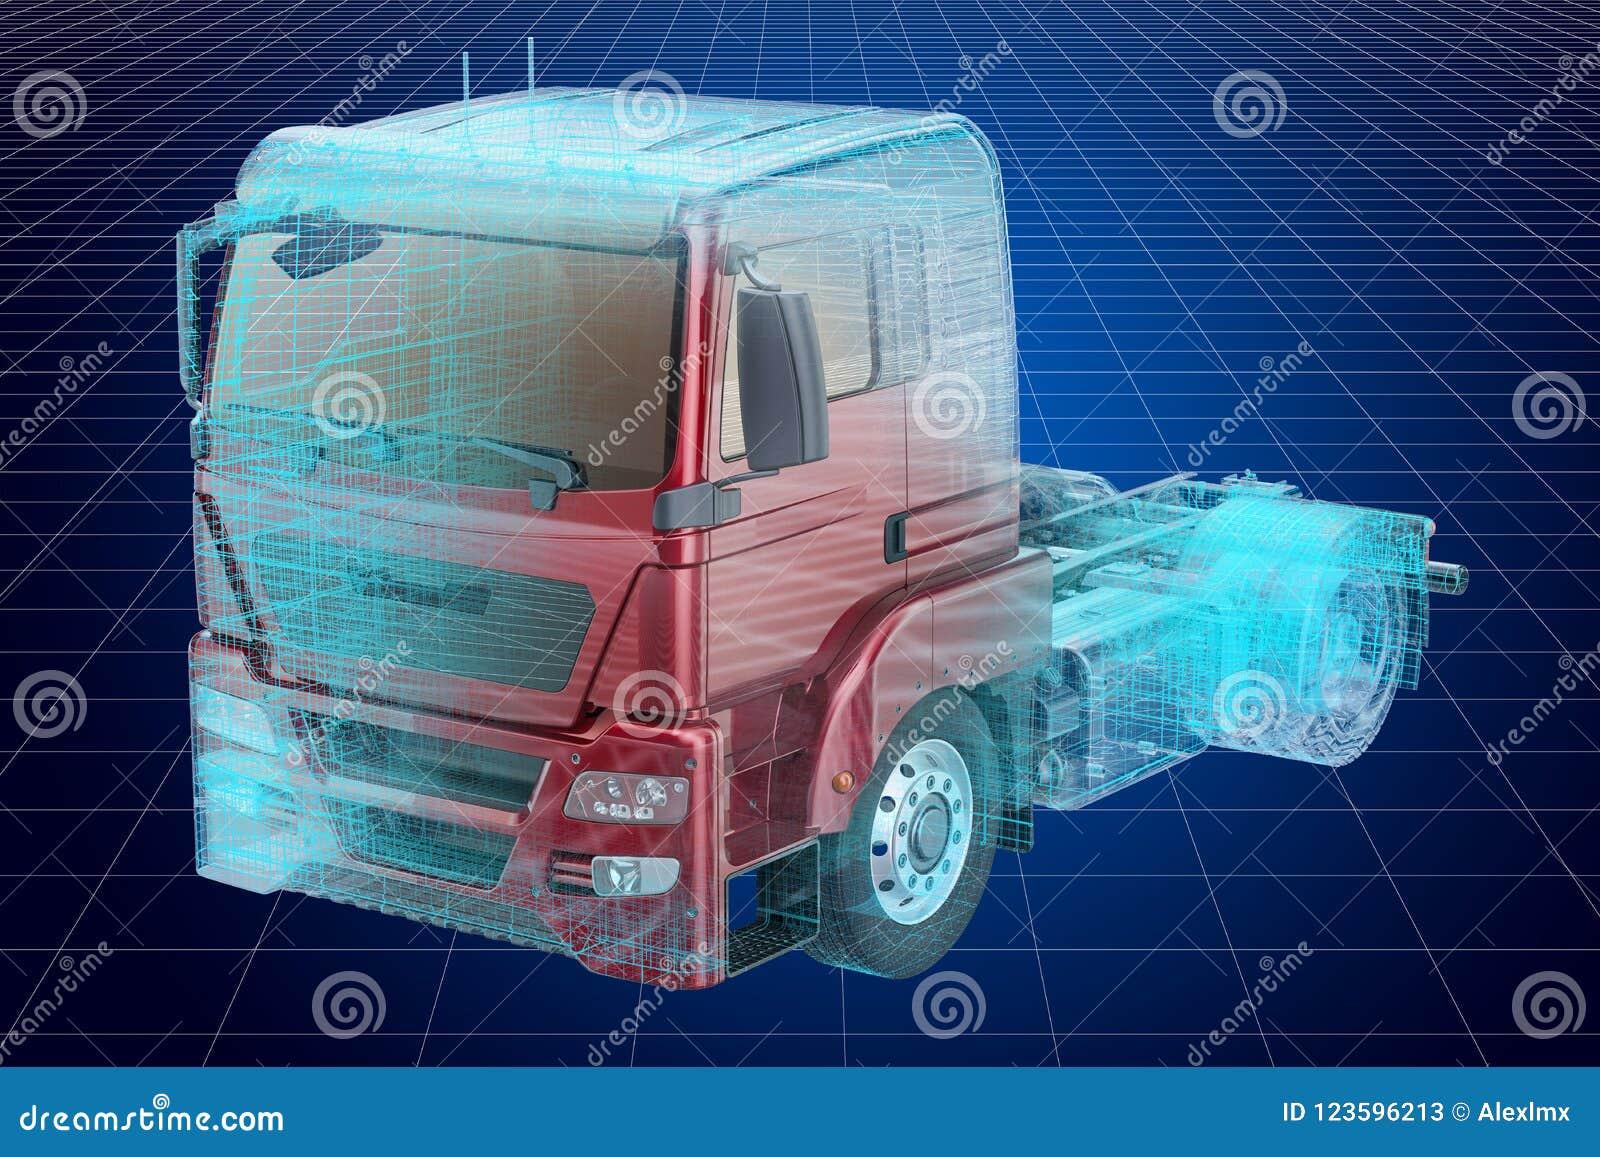 Visualization 3d Cad Model Of Truck, Blueprint  3D Rendering